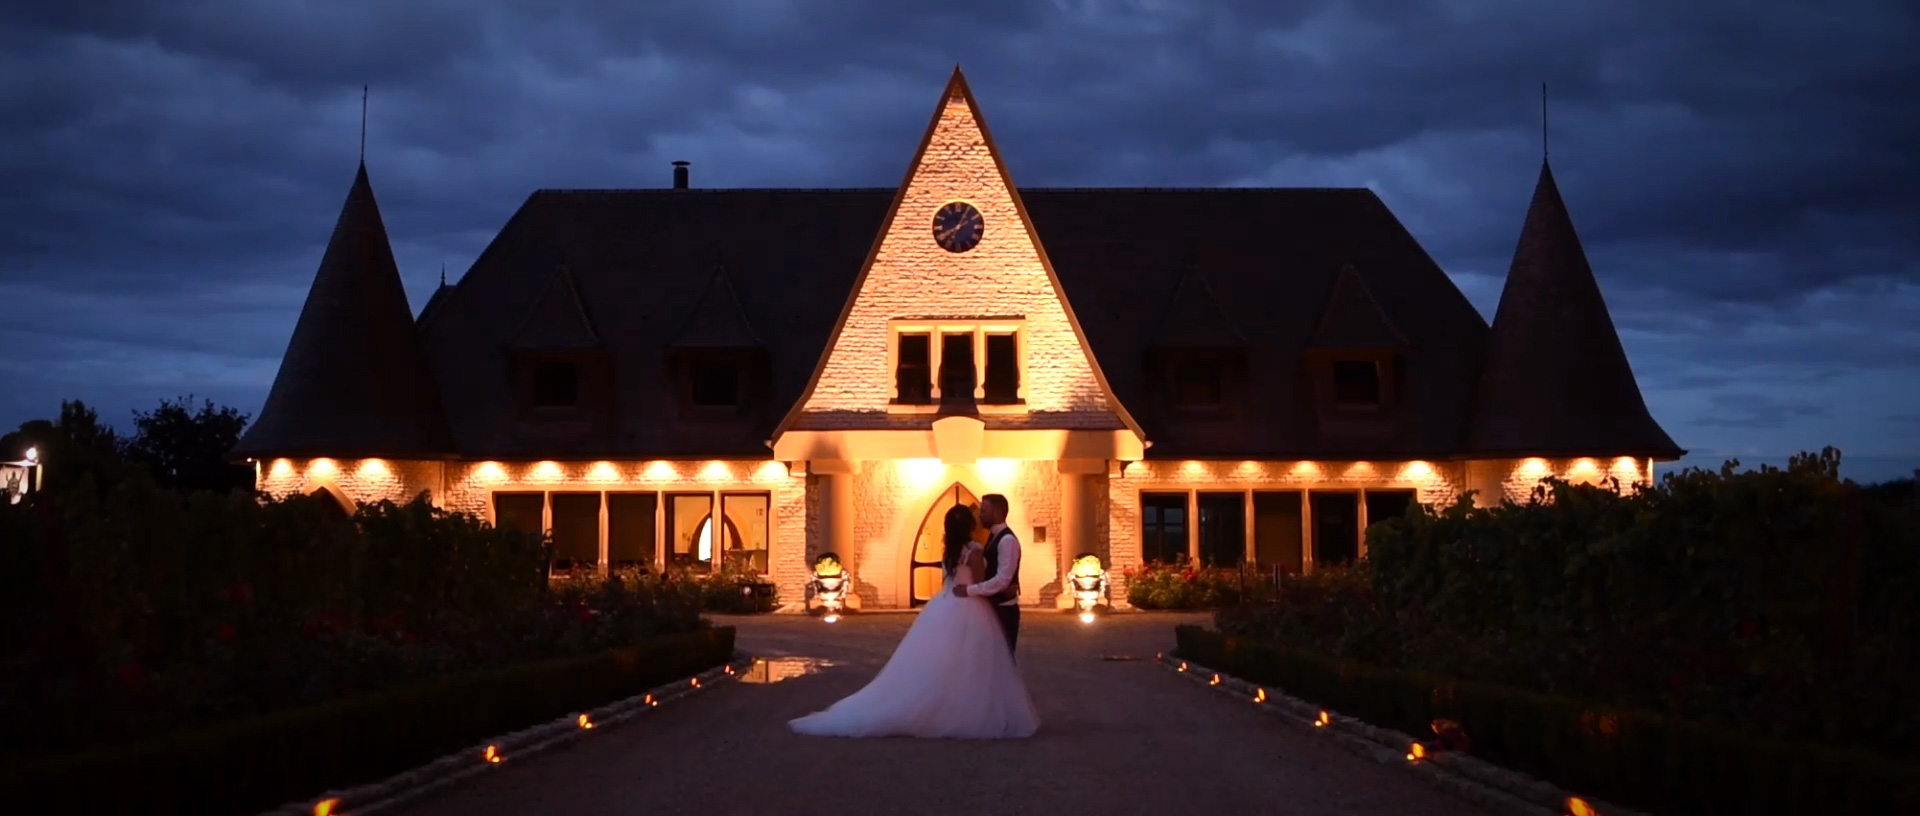 Vidéaste mariage wedding filmmaker - Alsace - Bas-Rhin Strasbourg - Colmar - Petit Wettolsheim